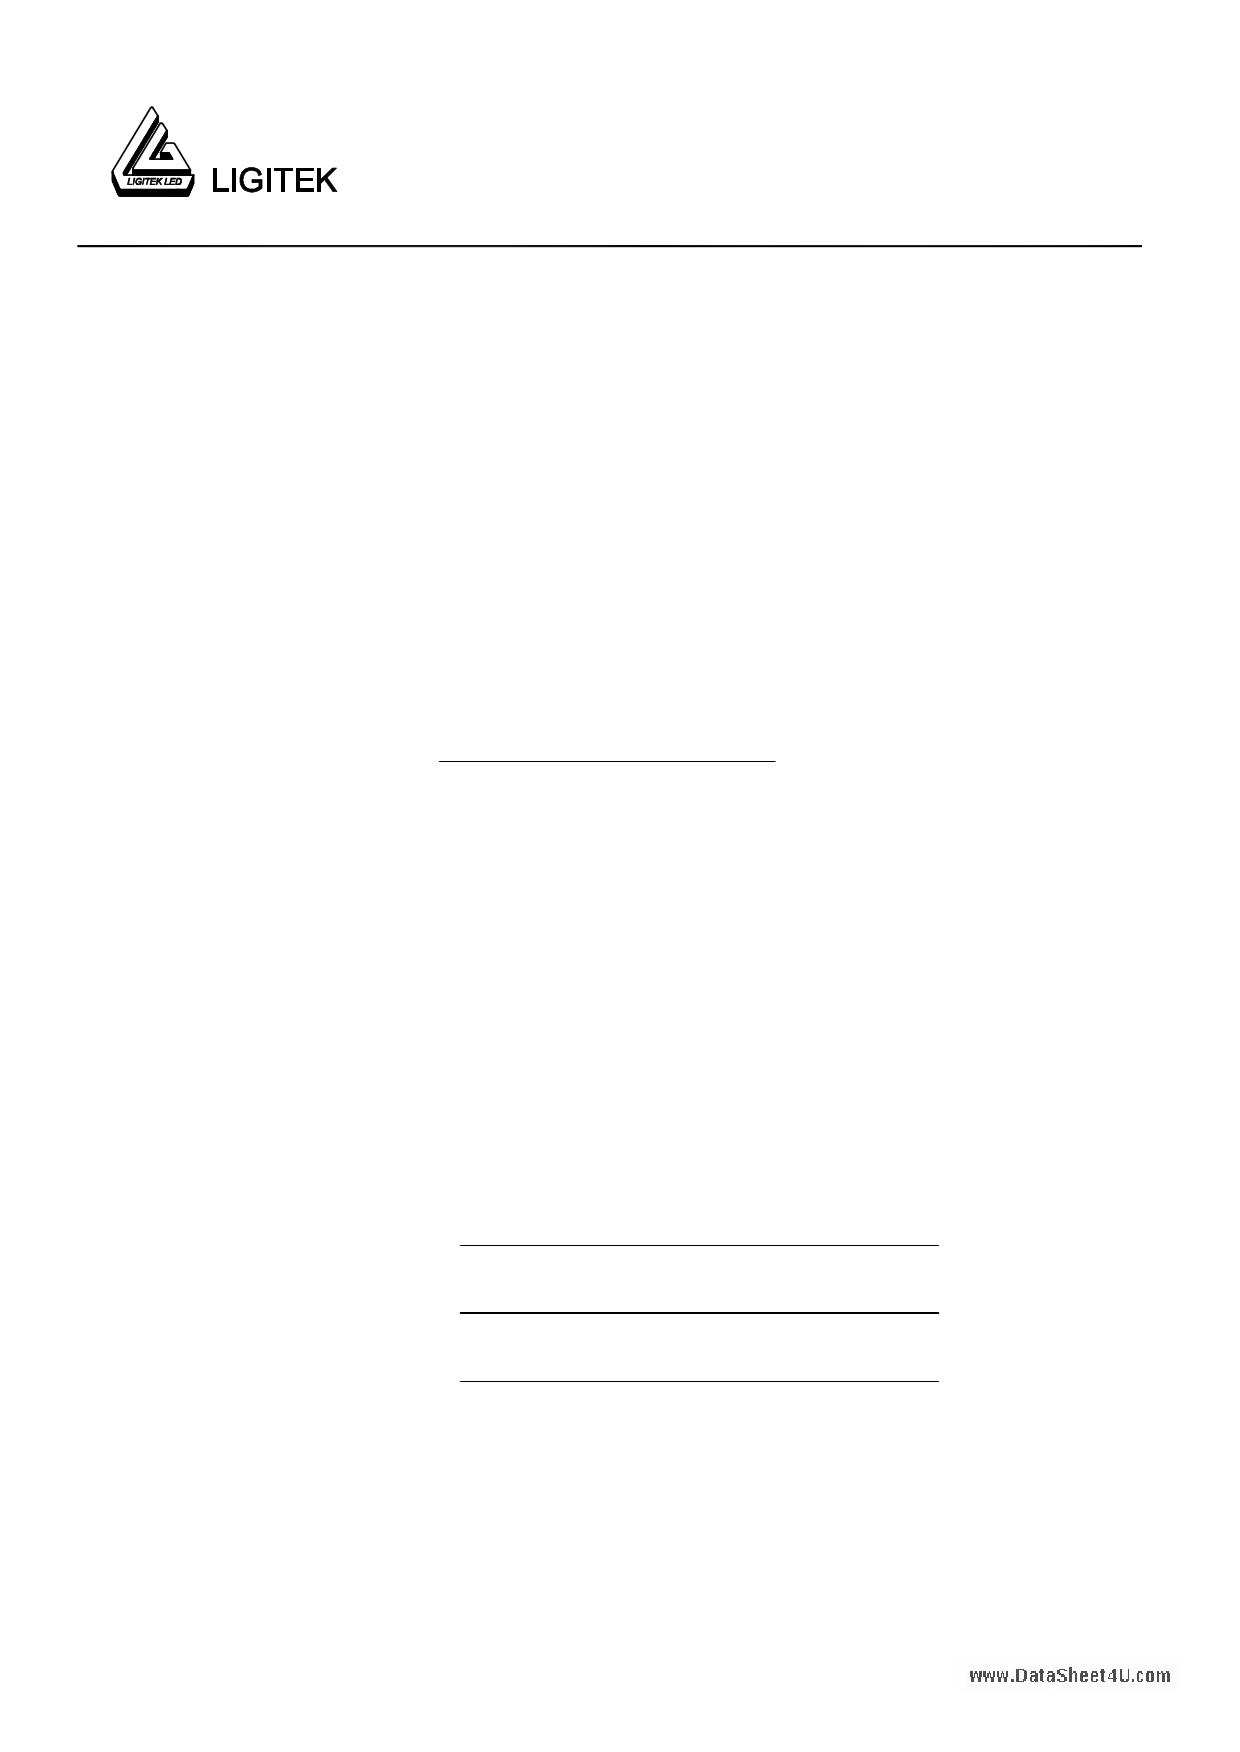 L-00501HRF-S datasheet